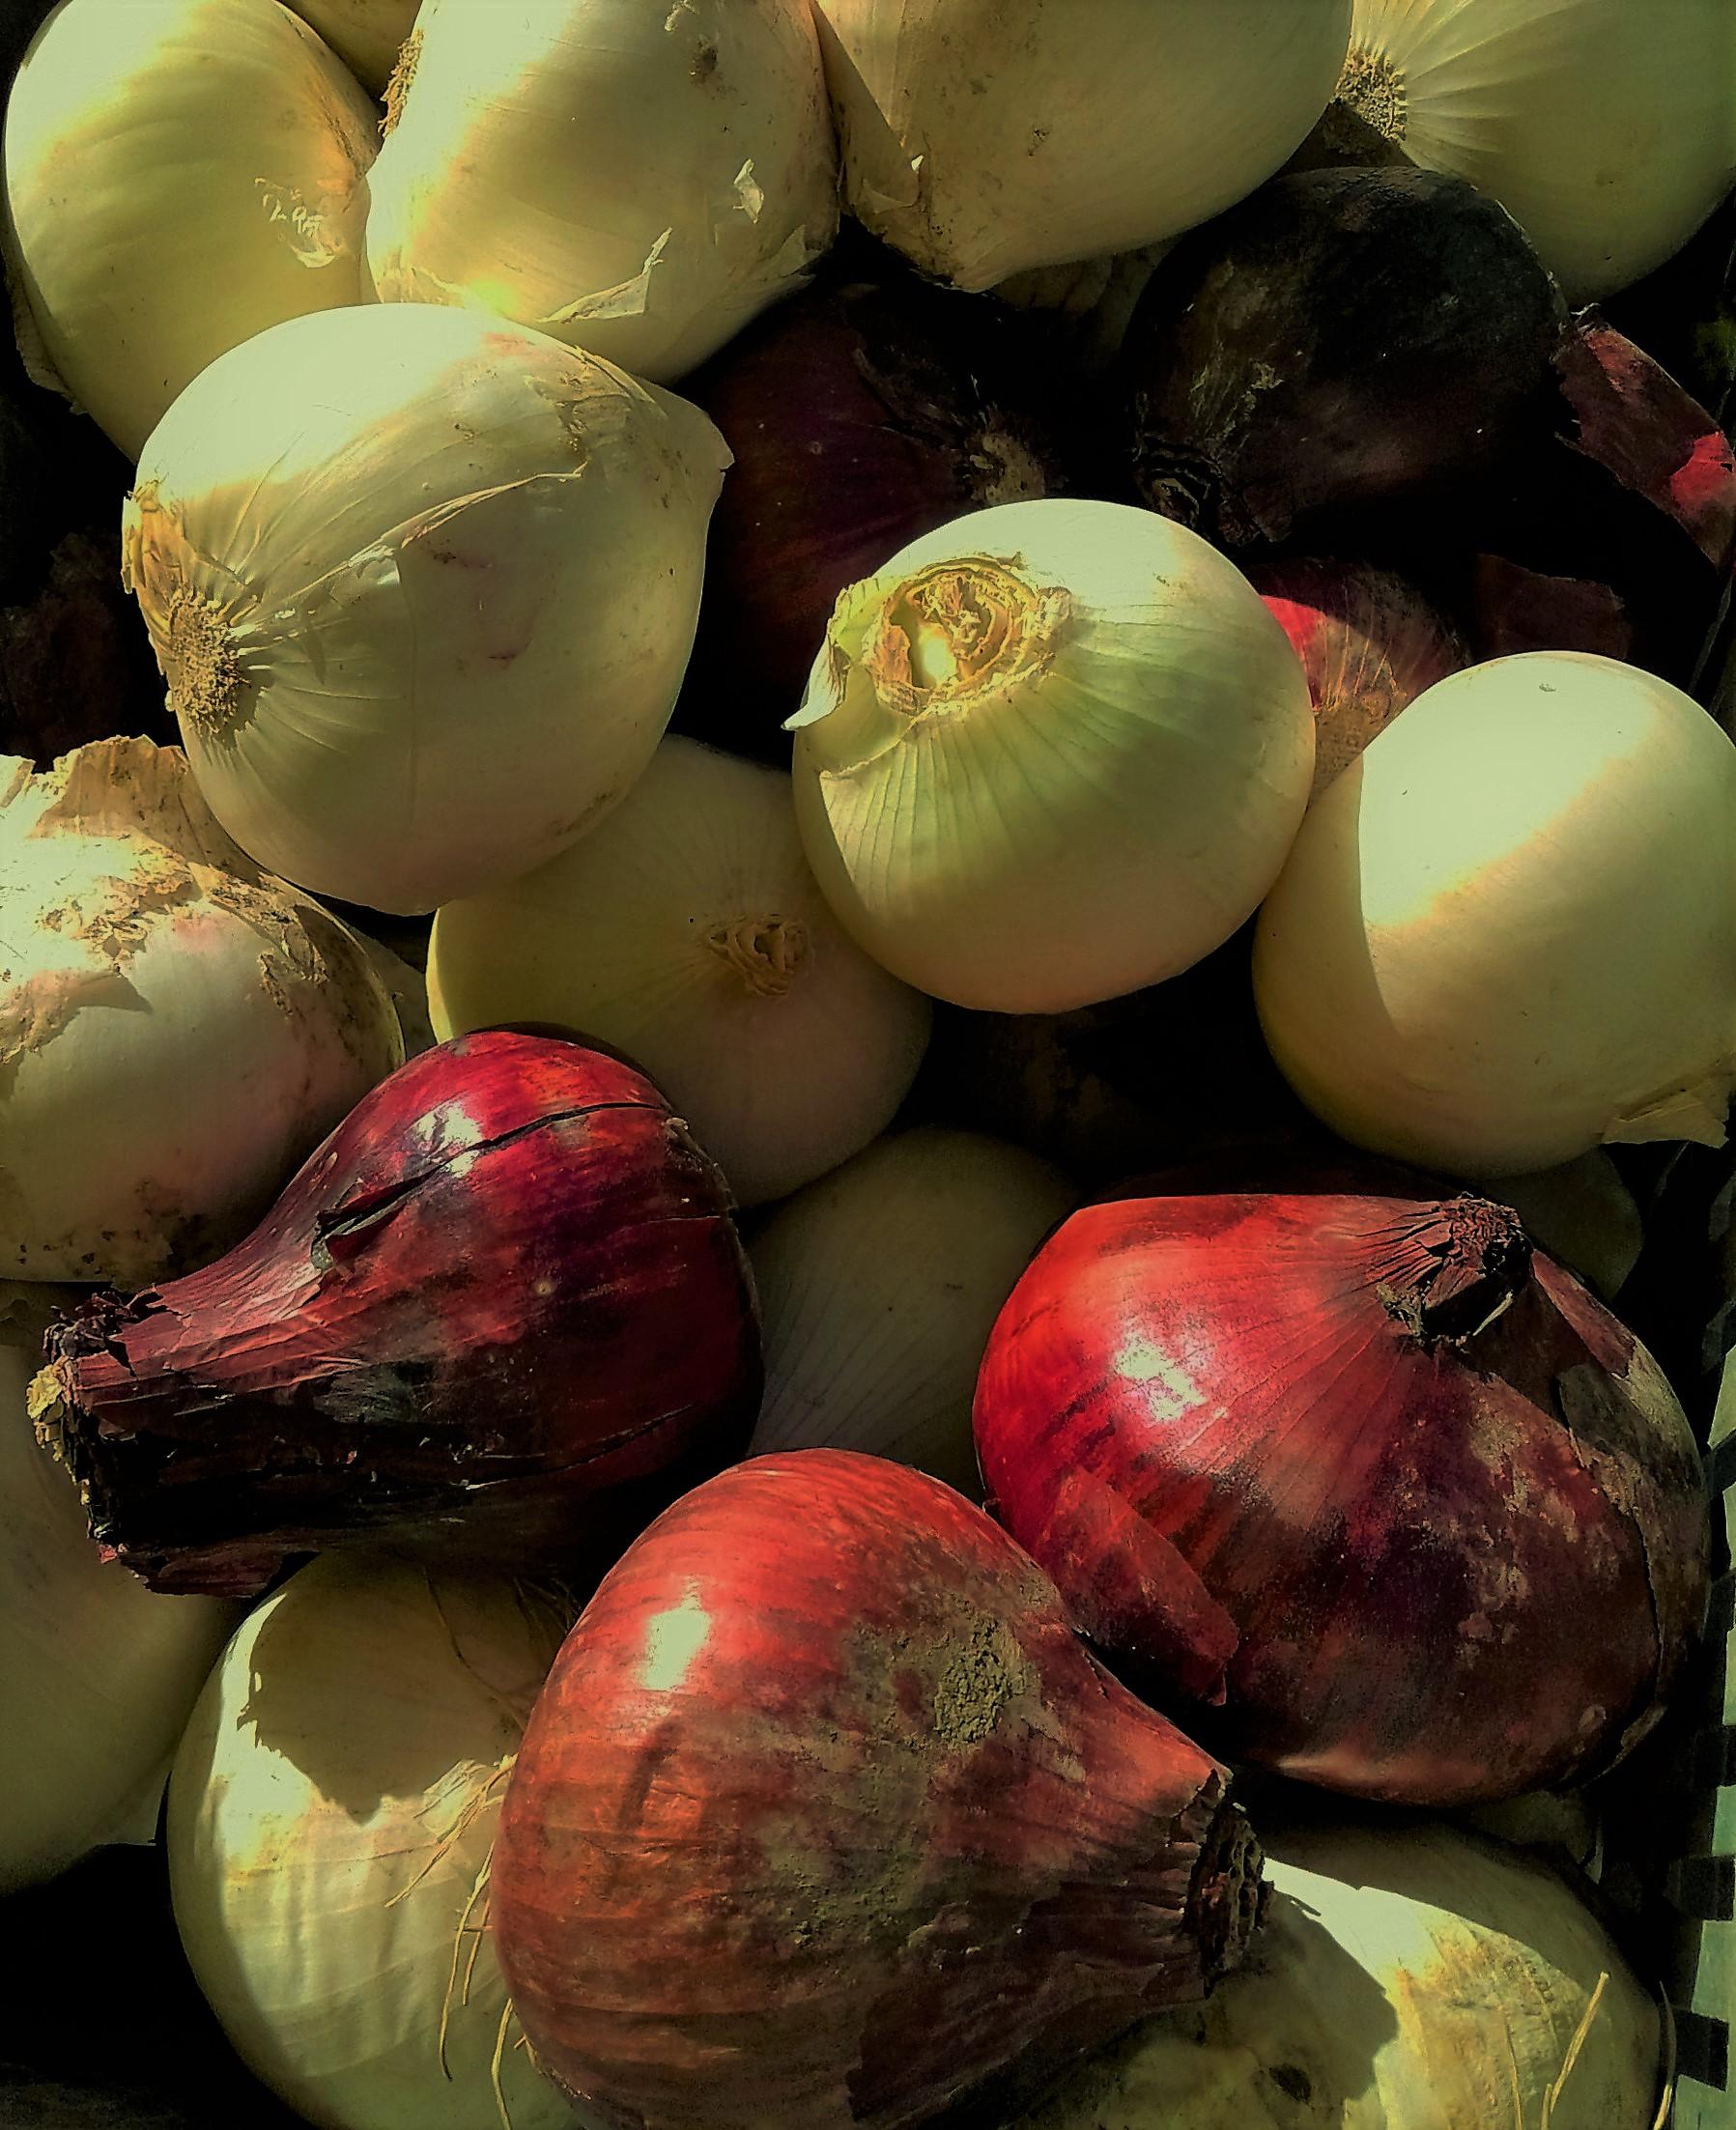 Cipolle rosse e bianche